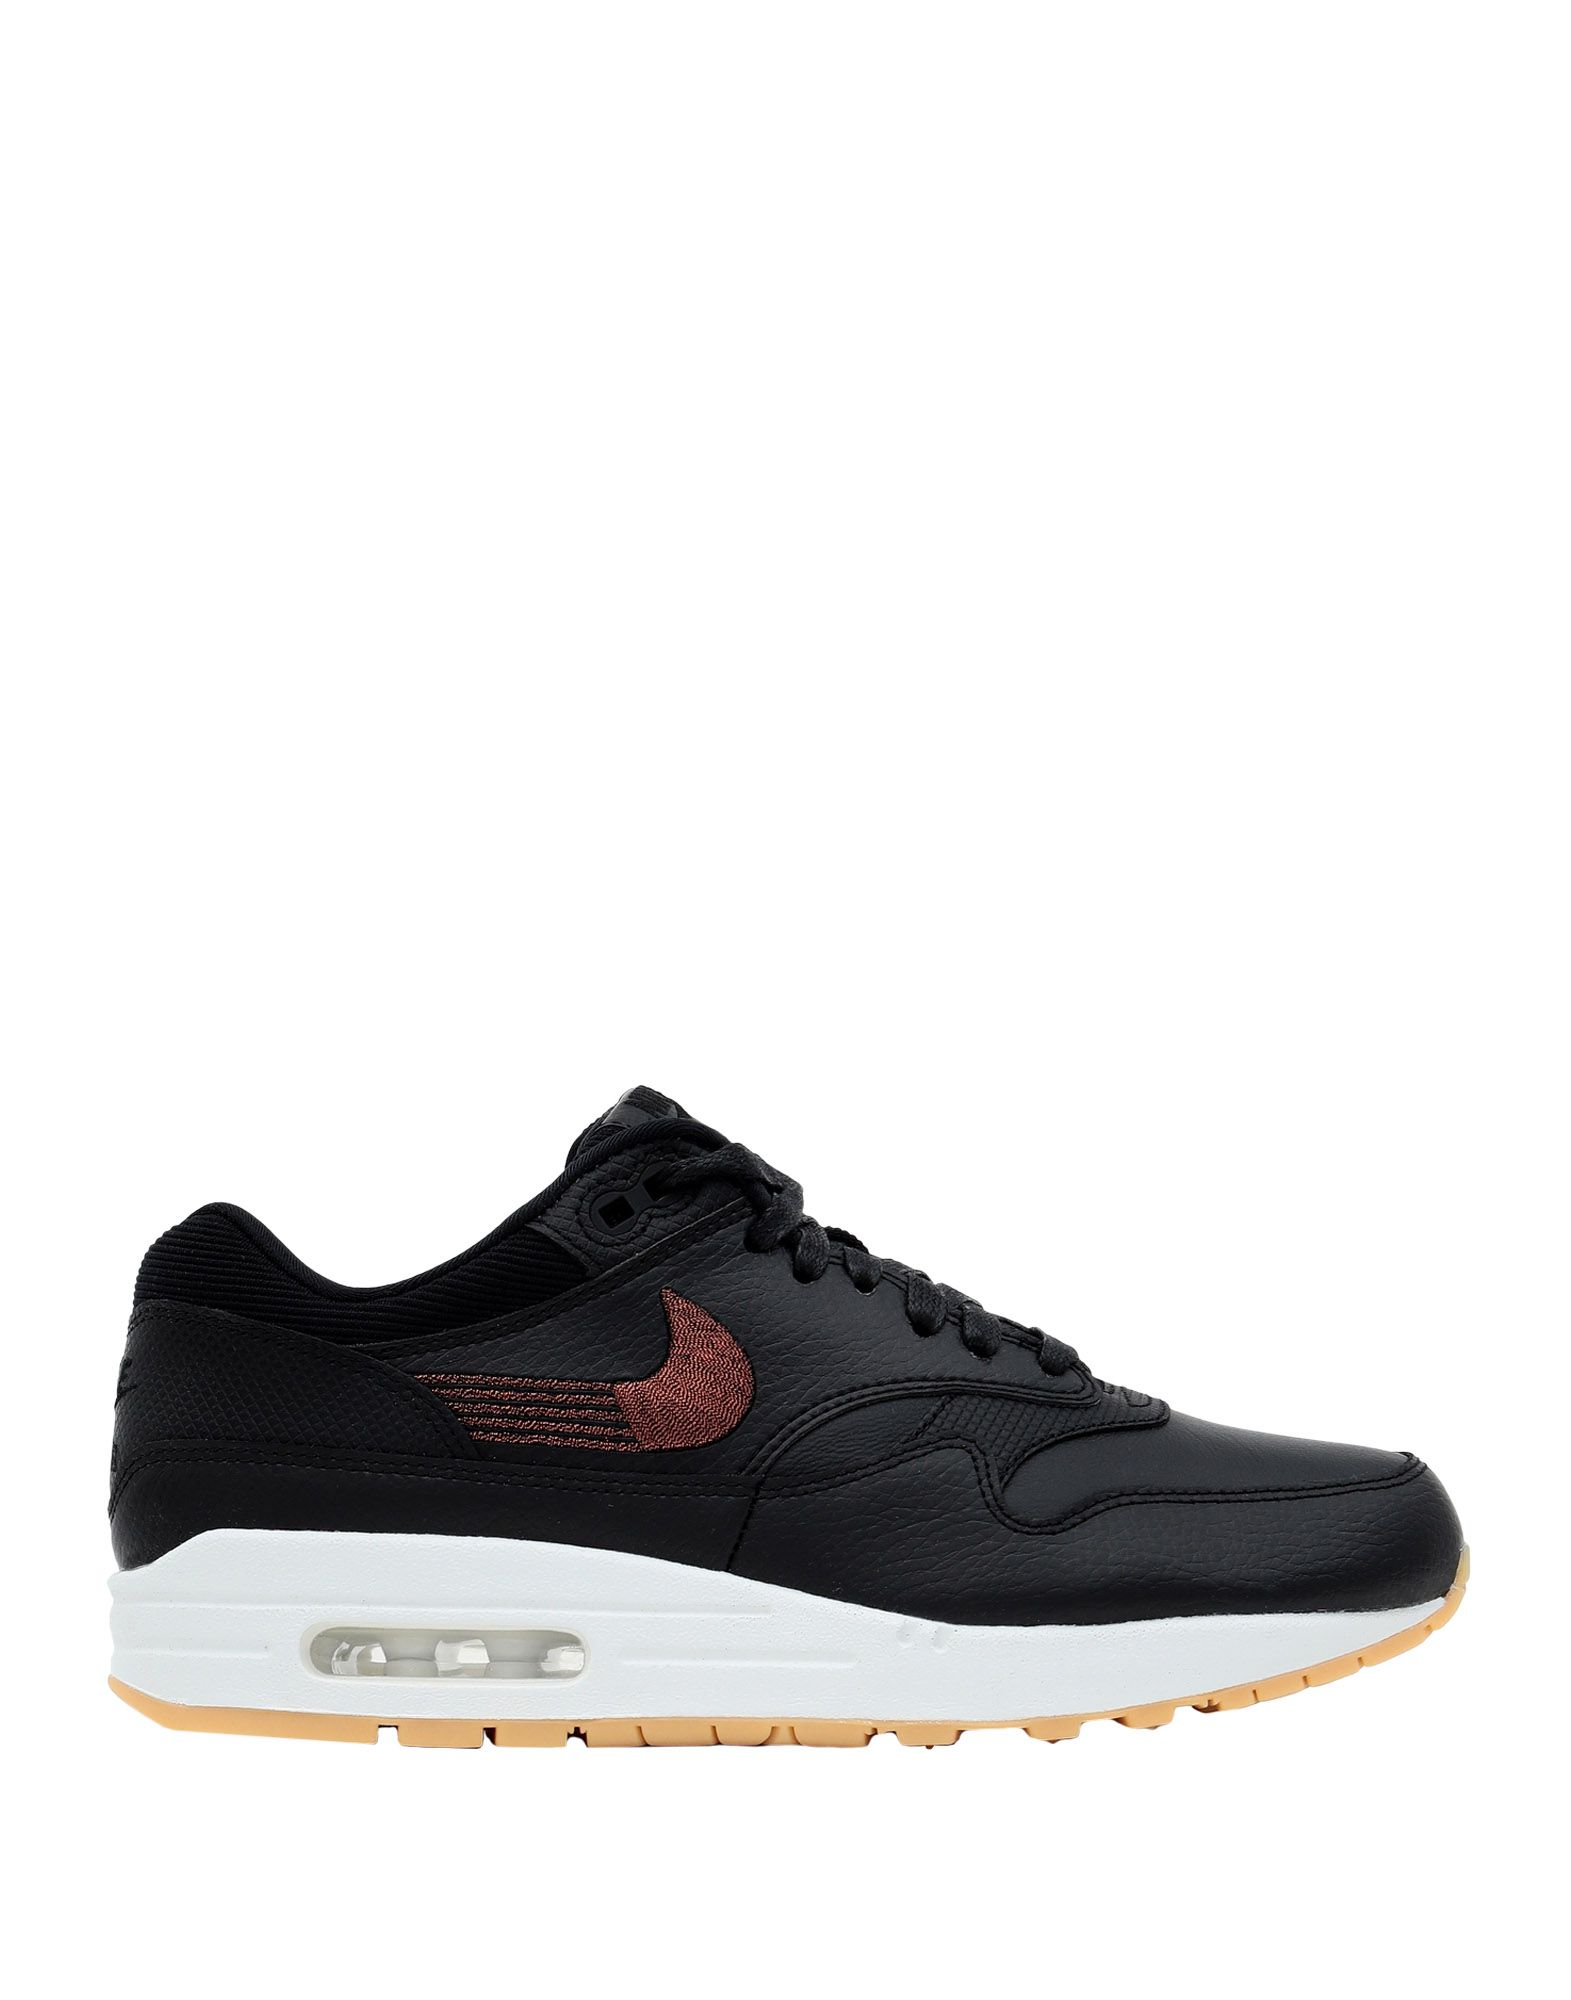 Nike   Air Max 1 Premium - Donna - 11556969OP